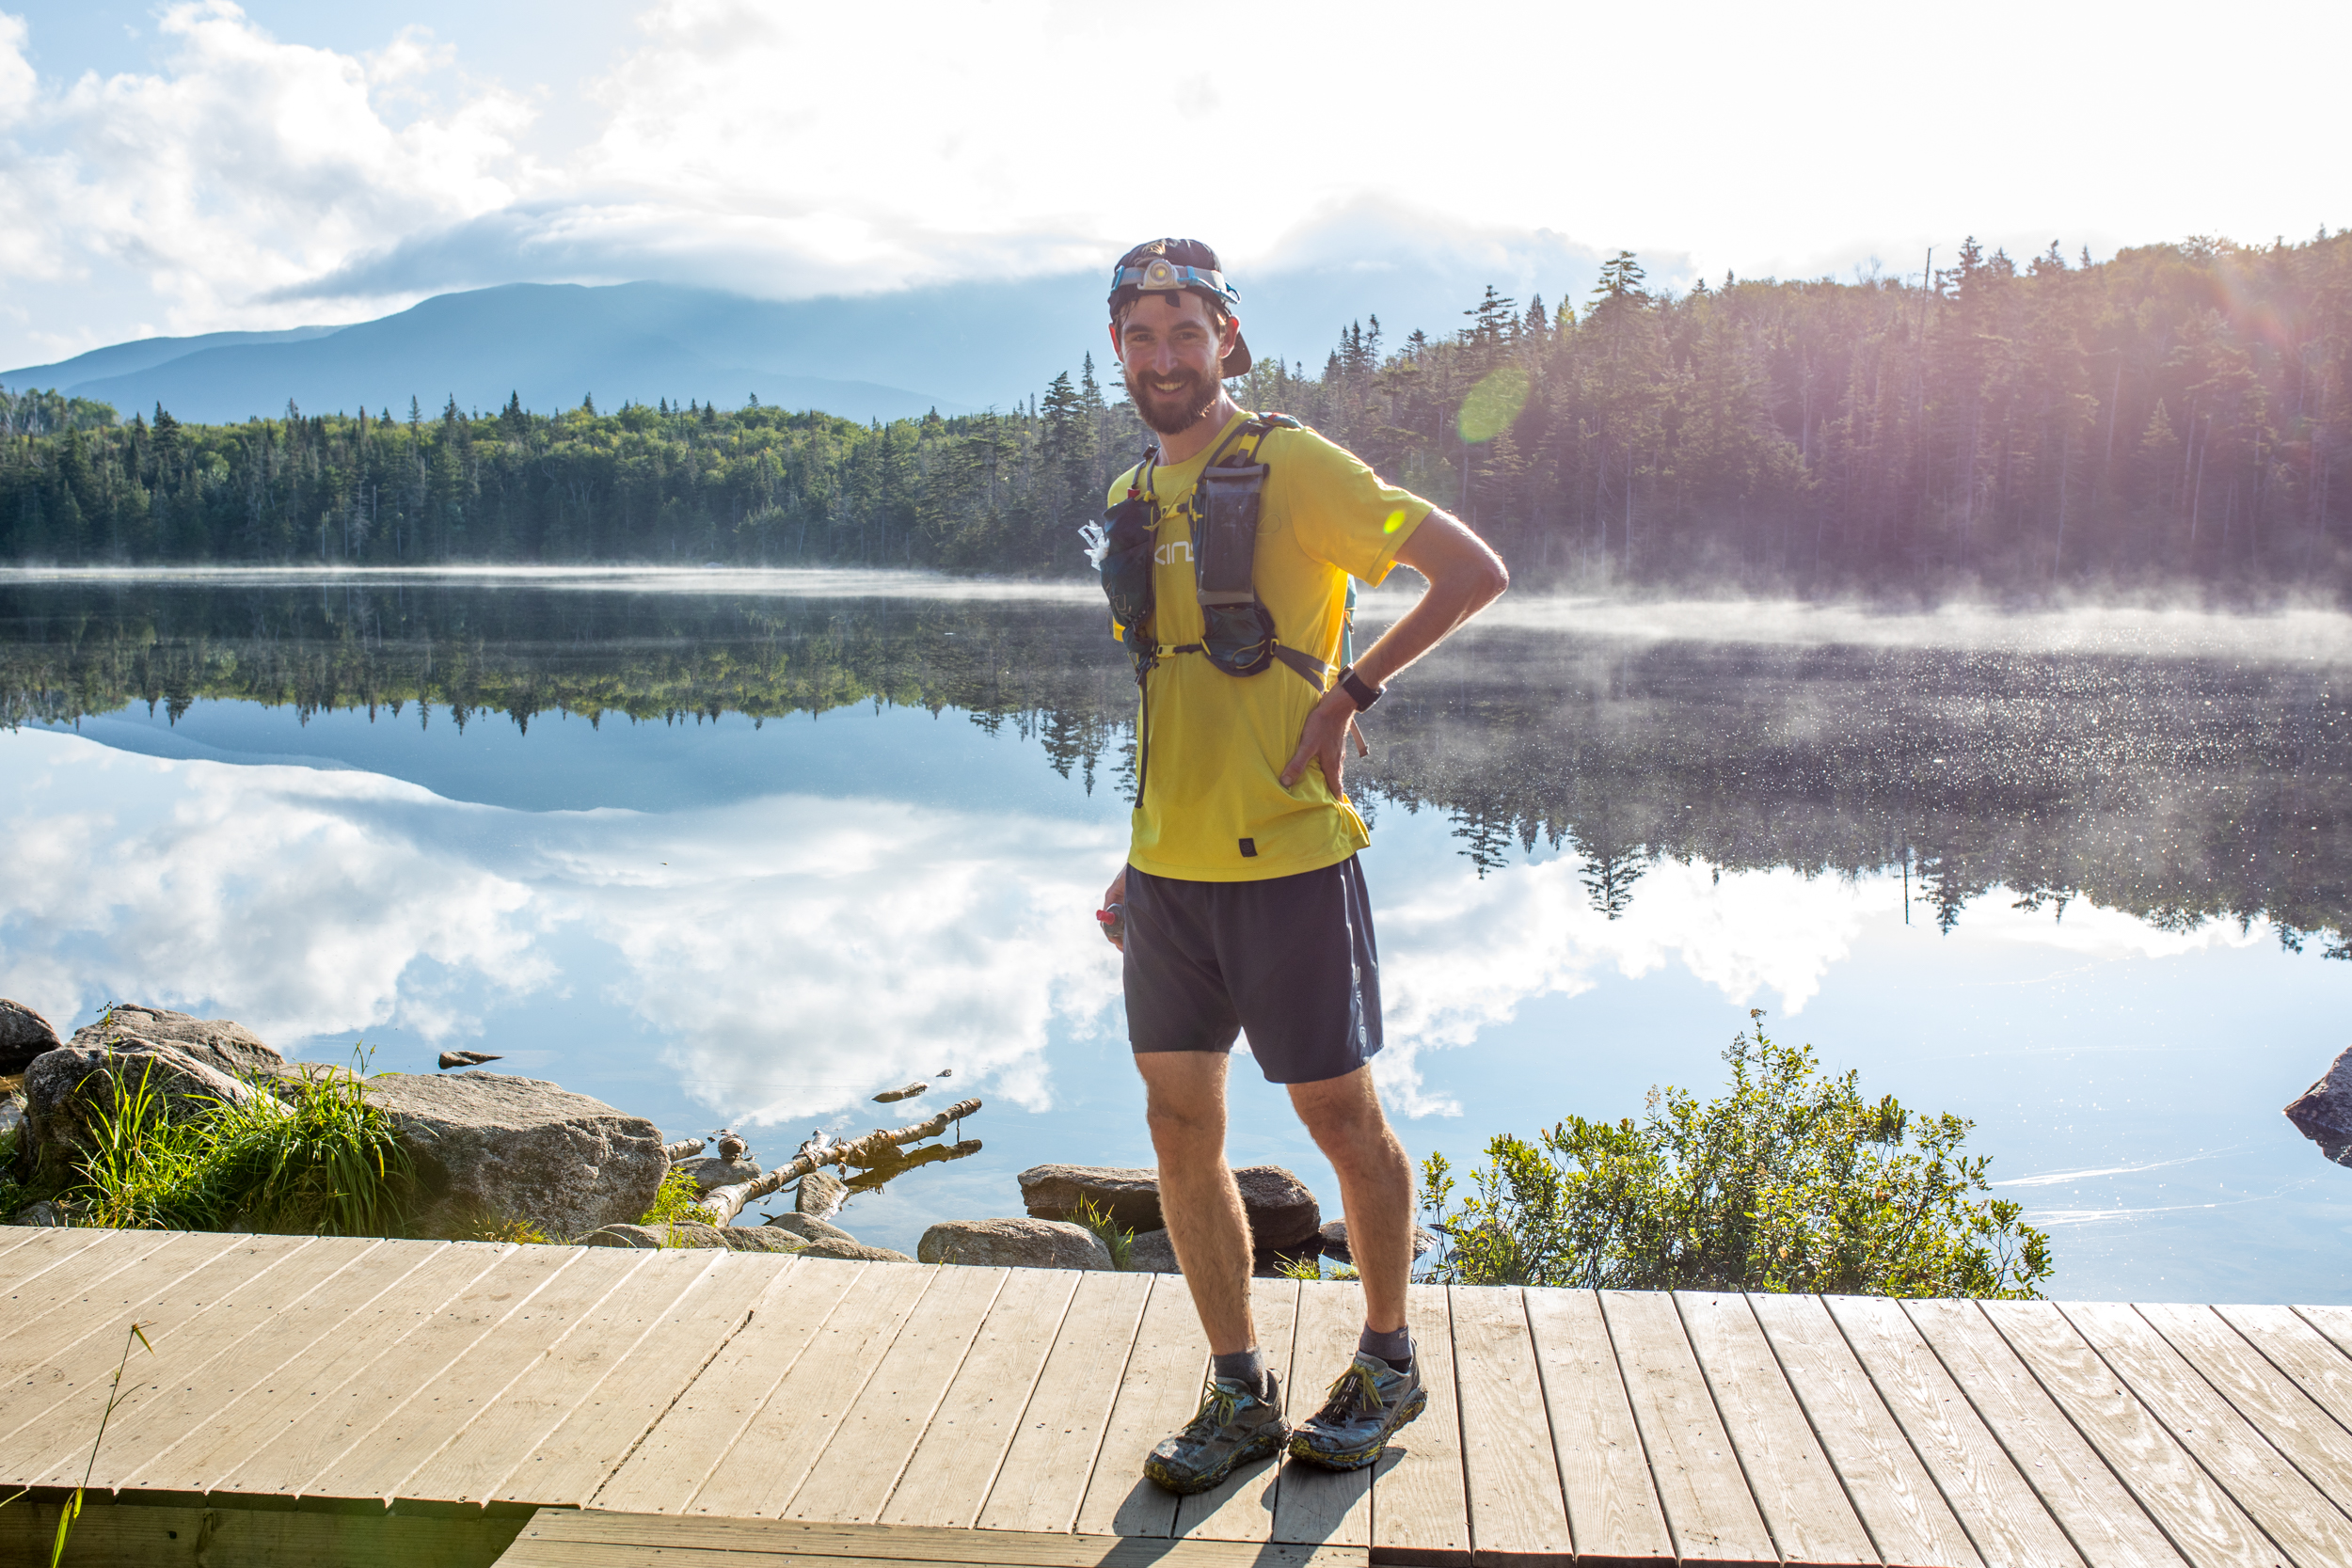 karel sabbe Appalachian Trail FKT.JPG